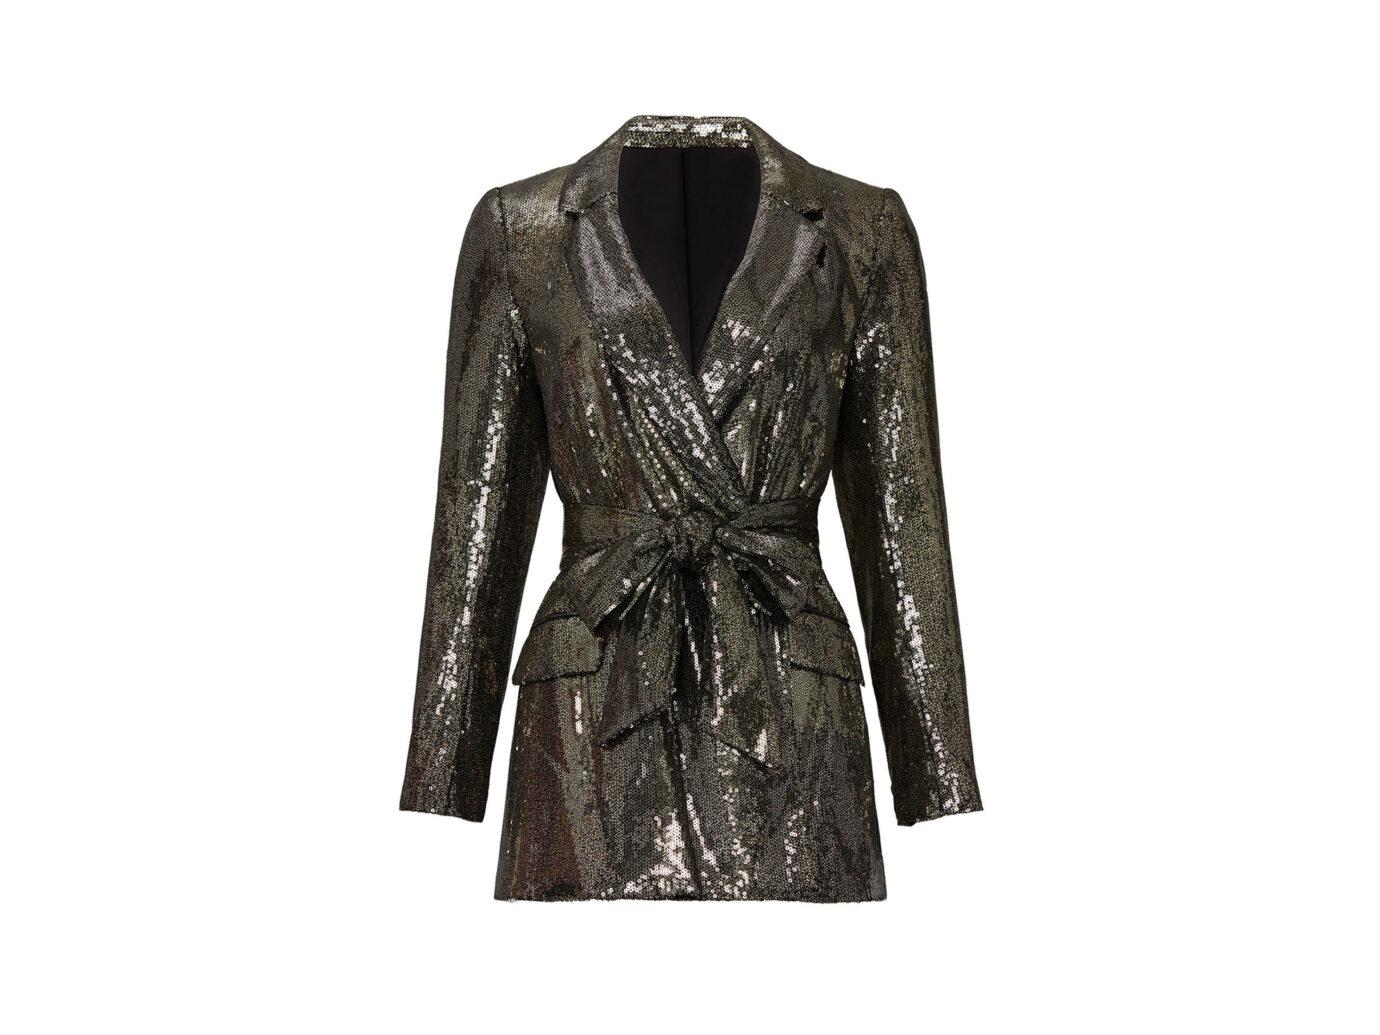 Rent the Runway Unlimited Membership, sequined blazer